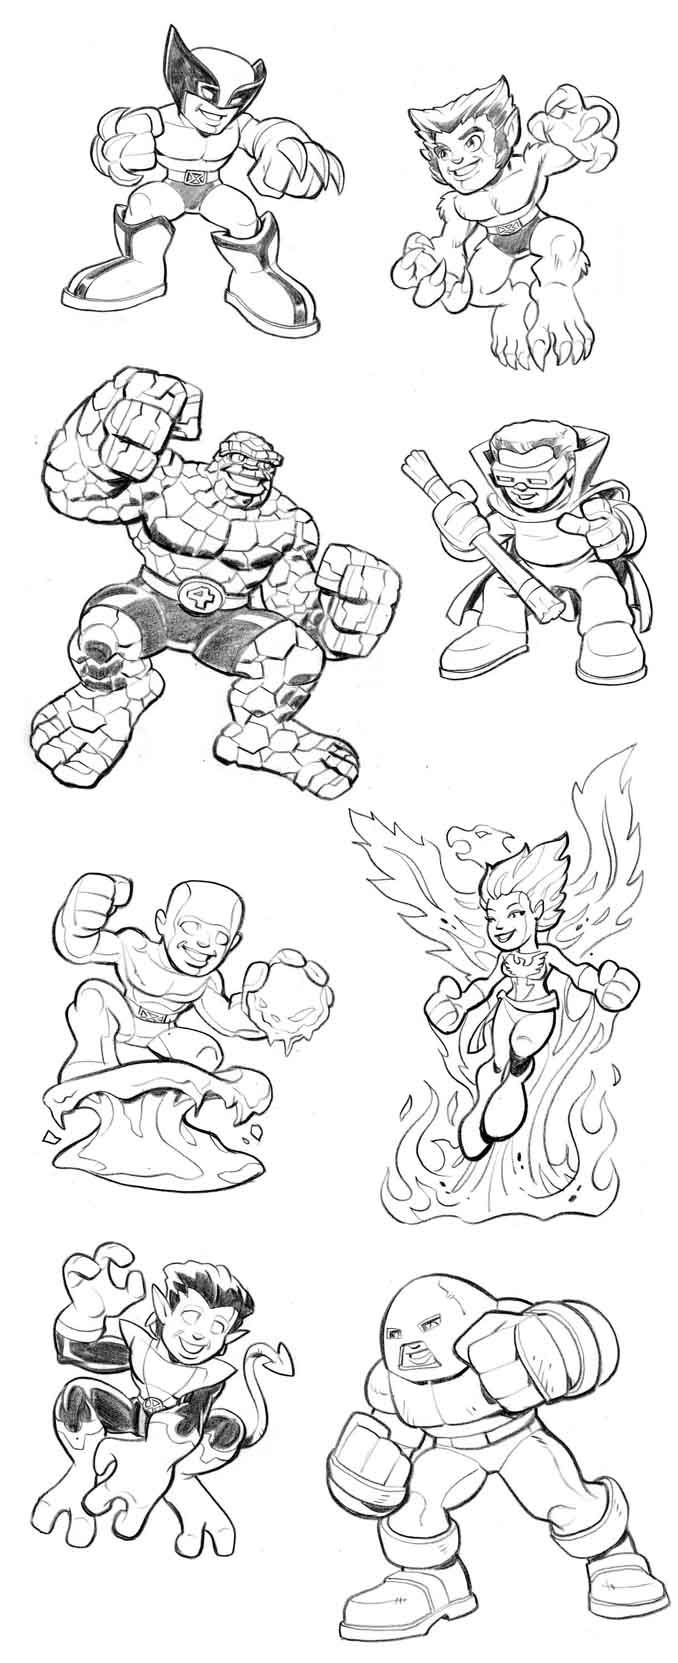 Wolverine 74948 Superheroes Printable Coloring Pages